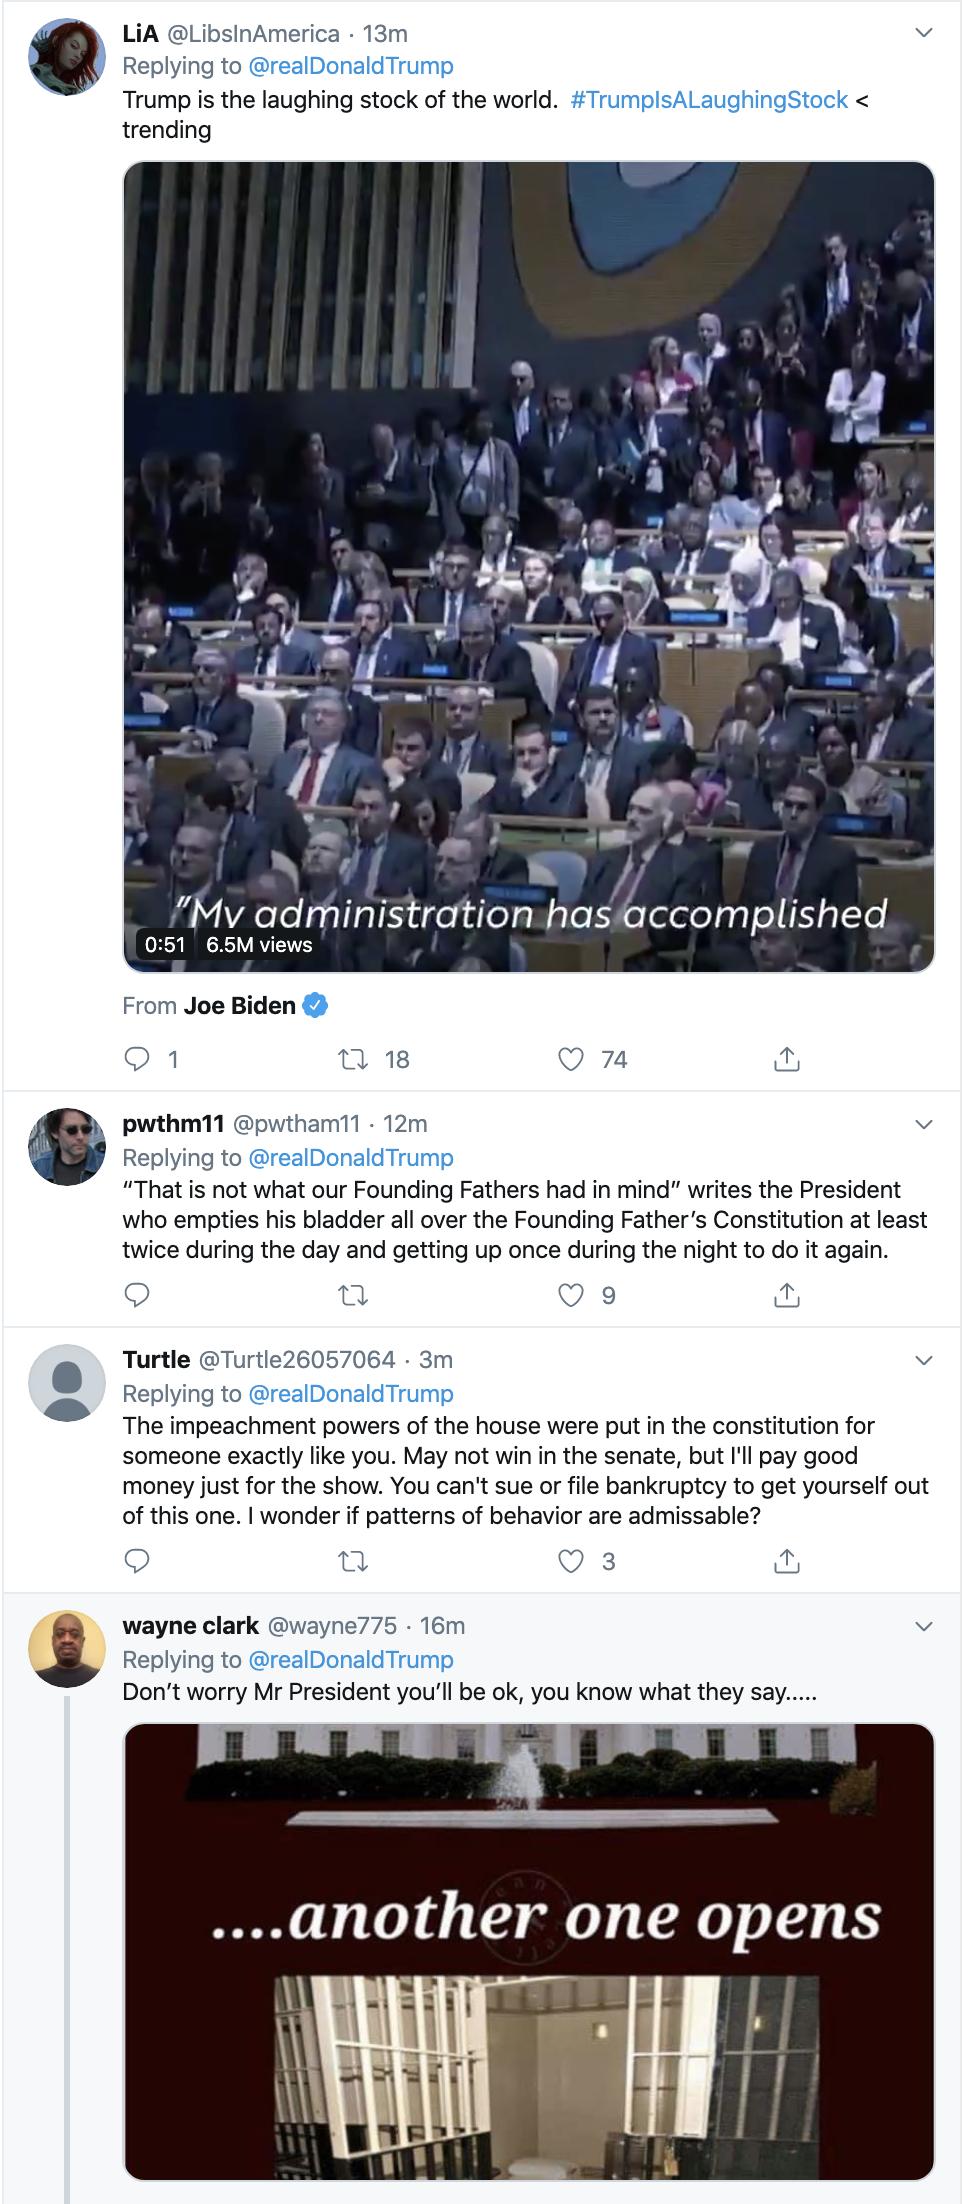 Screen-Shot-2019-12-05-at-9.37.36-AM Trump Attacks Pelosi After Impeachment Articles Anouncement Donald Trump Featured Impeachment Investigation Top Stories Uncategorized